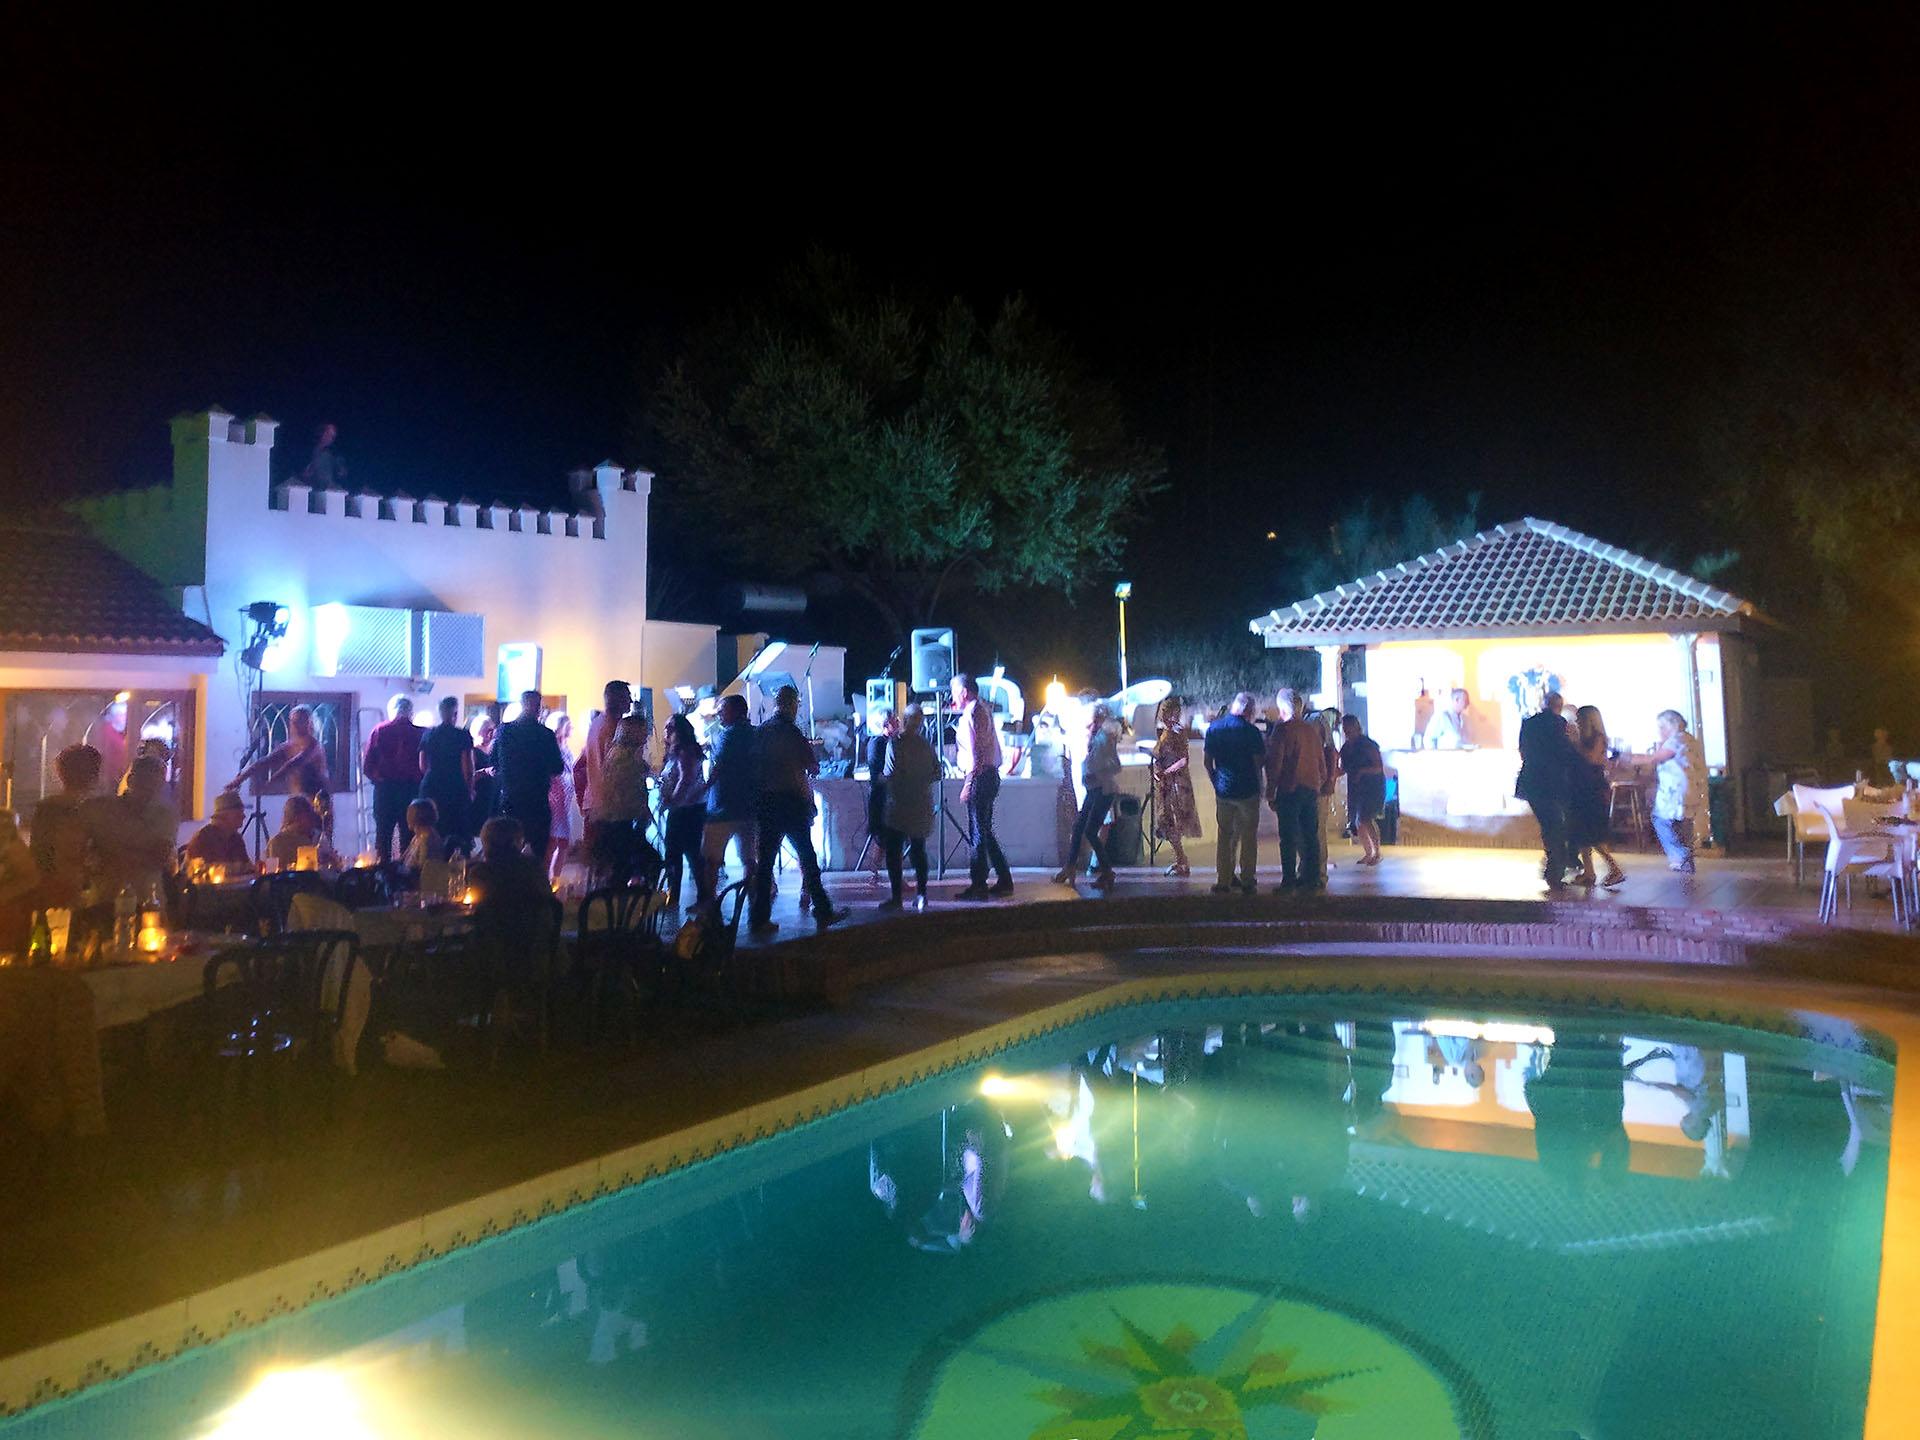 Party at night